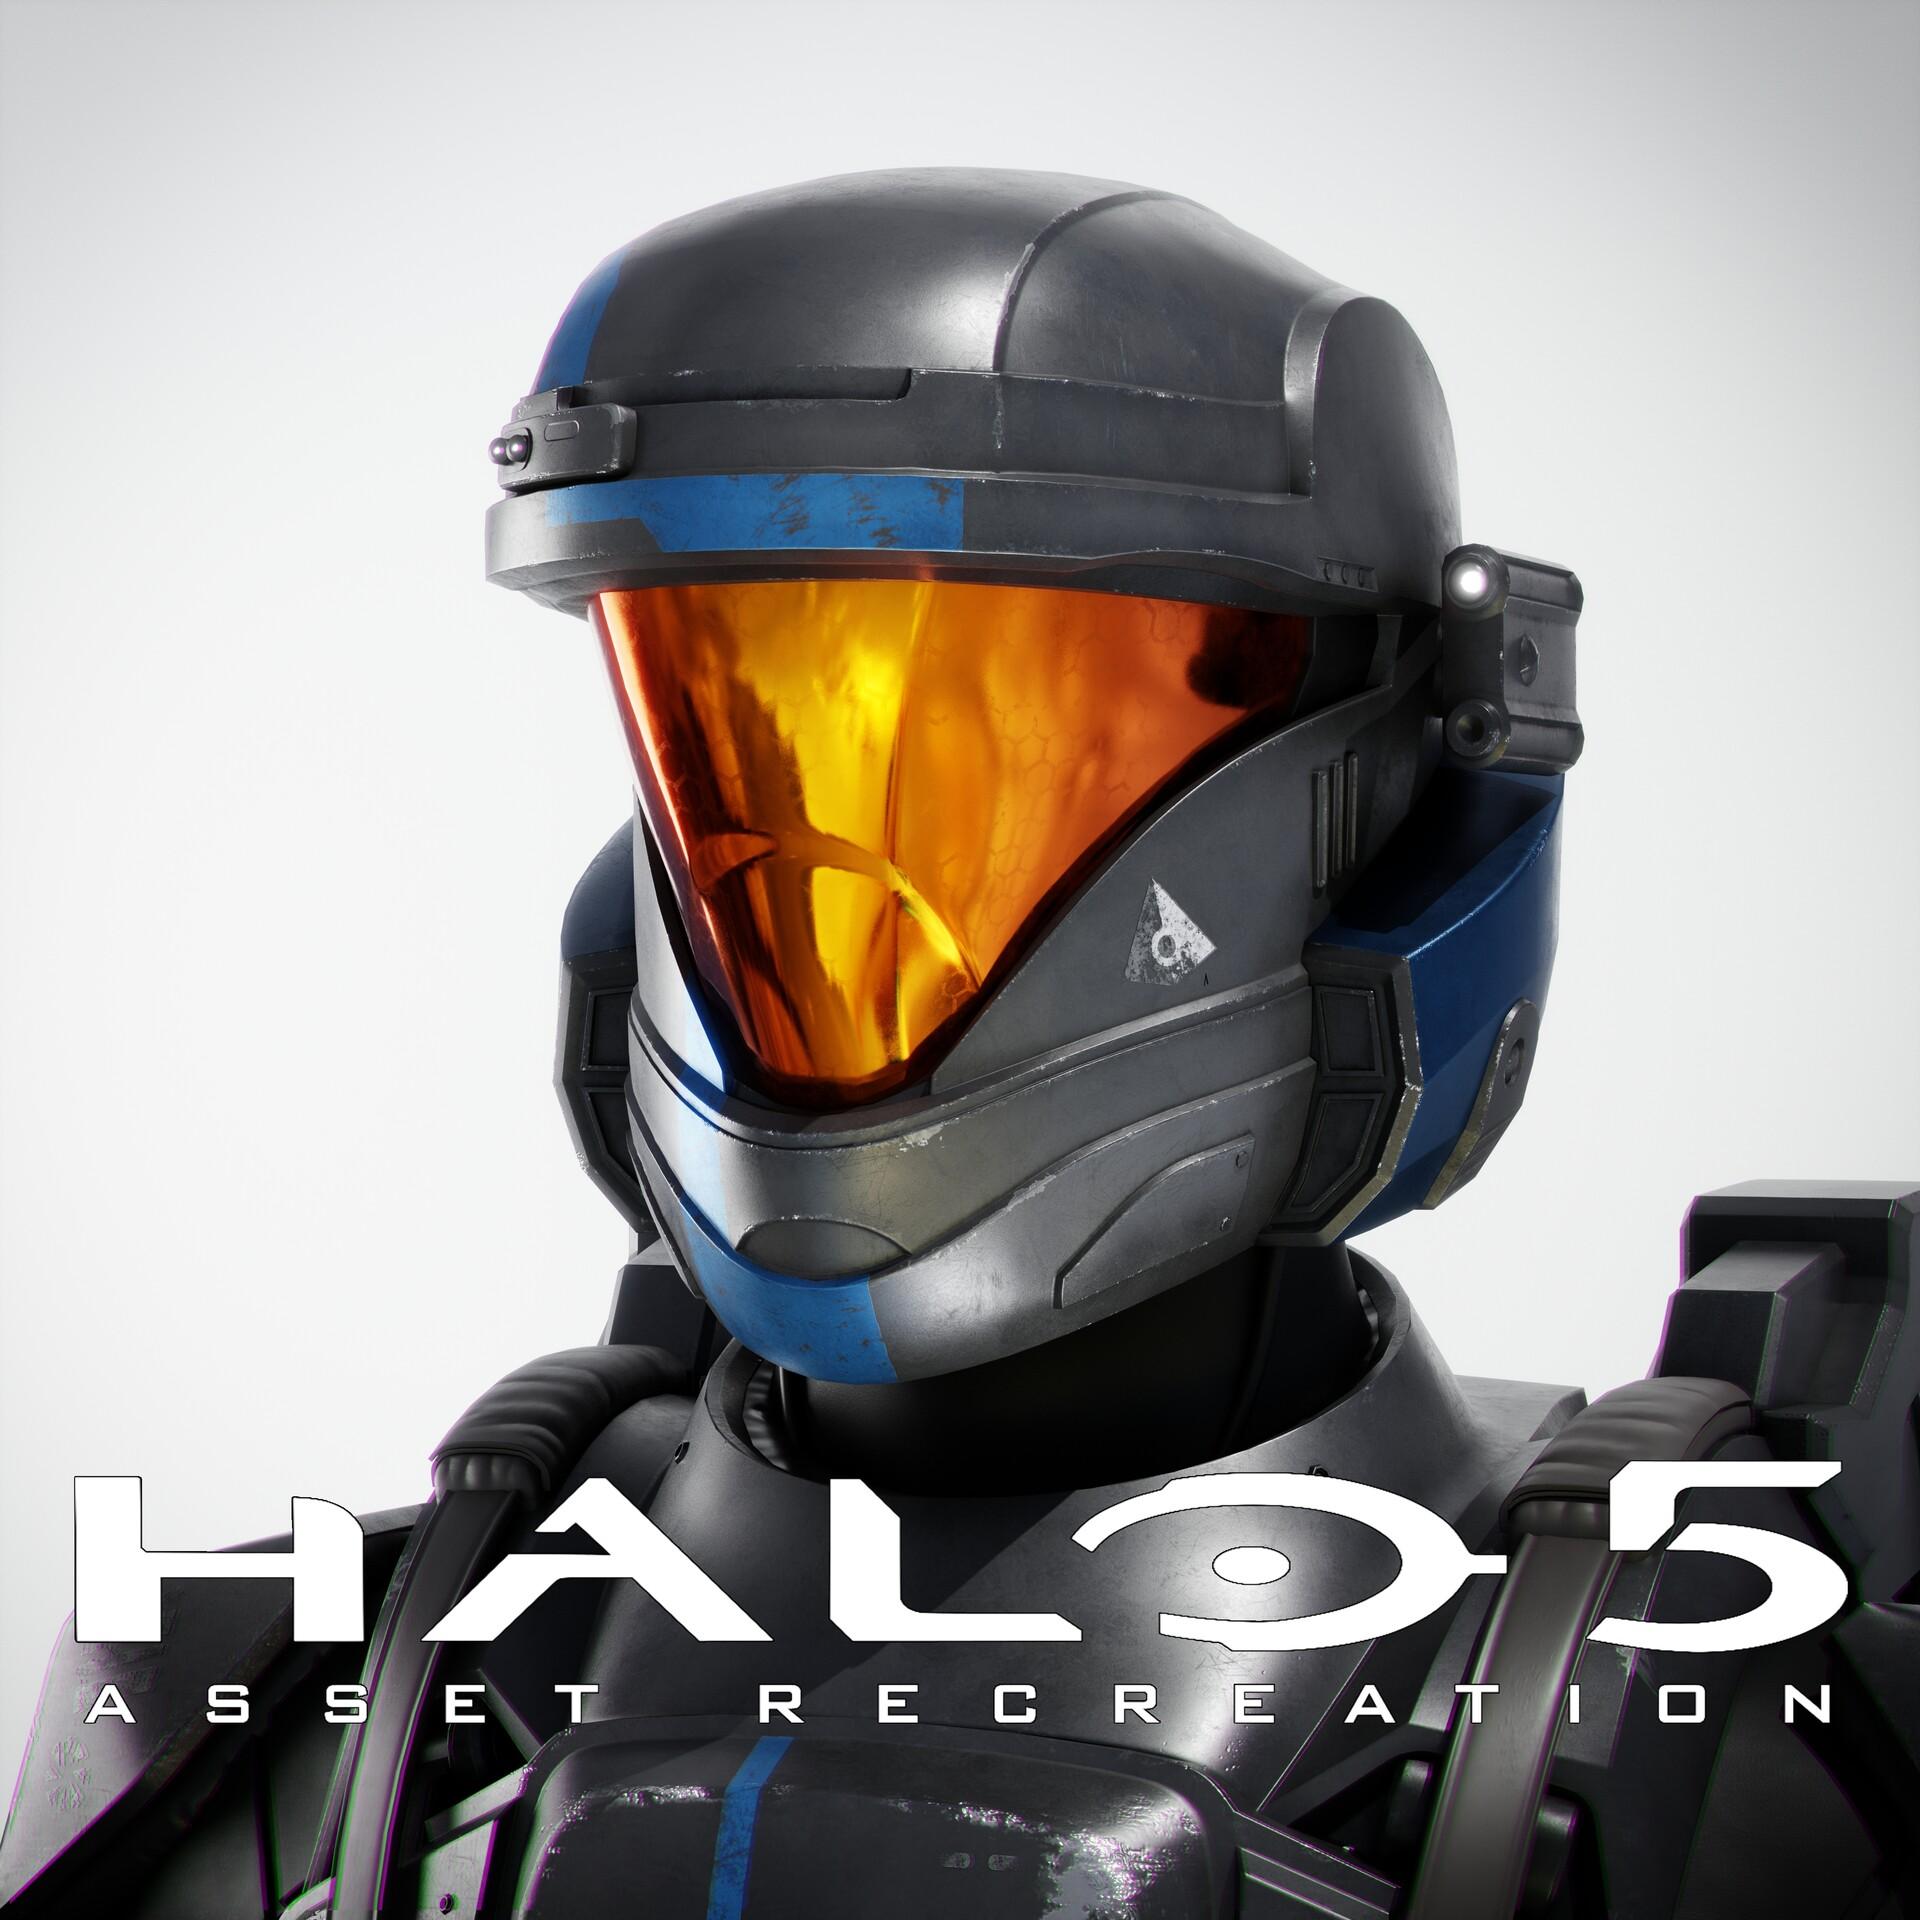 odst halo nightfall armor